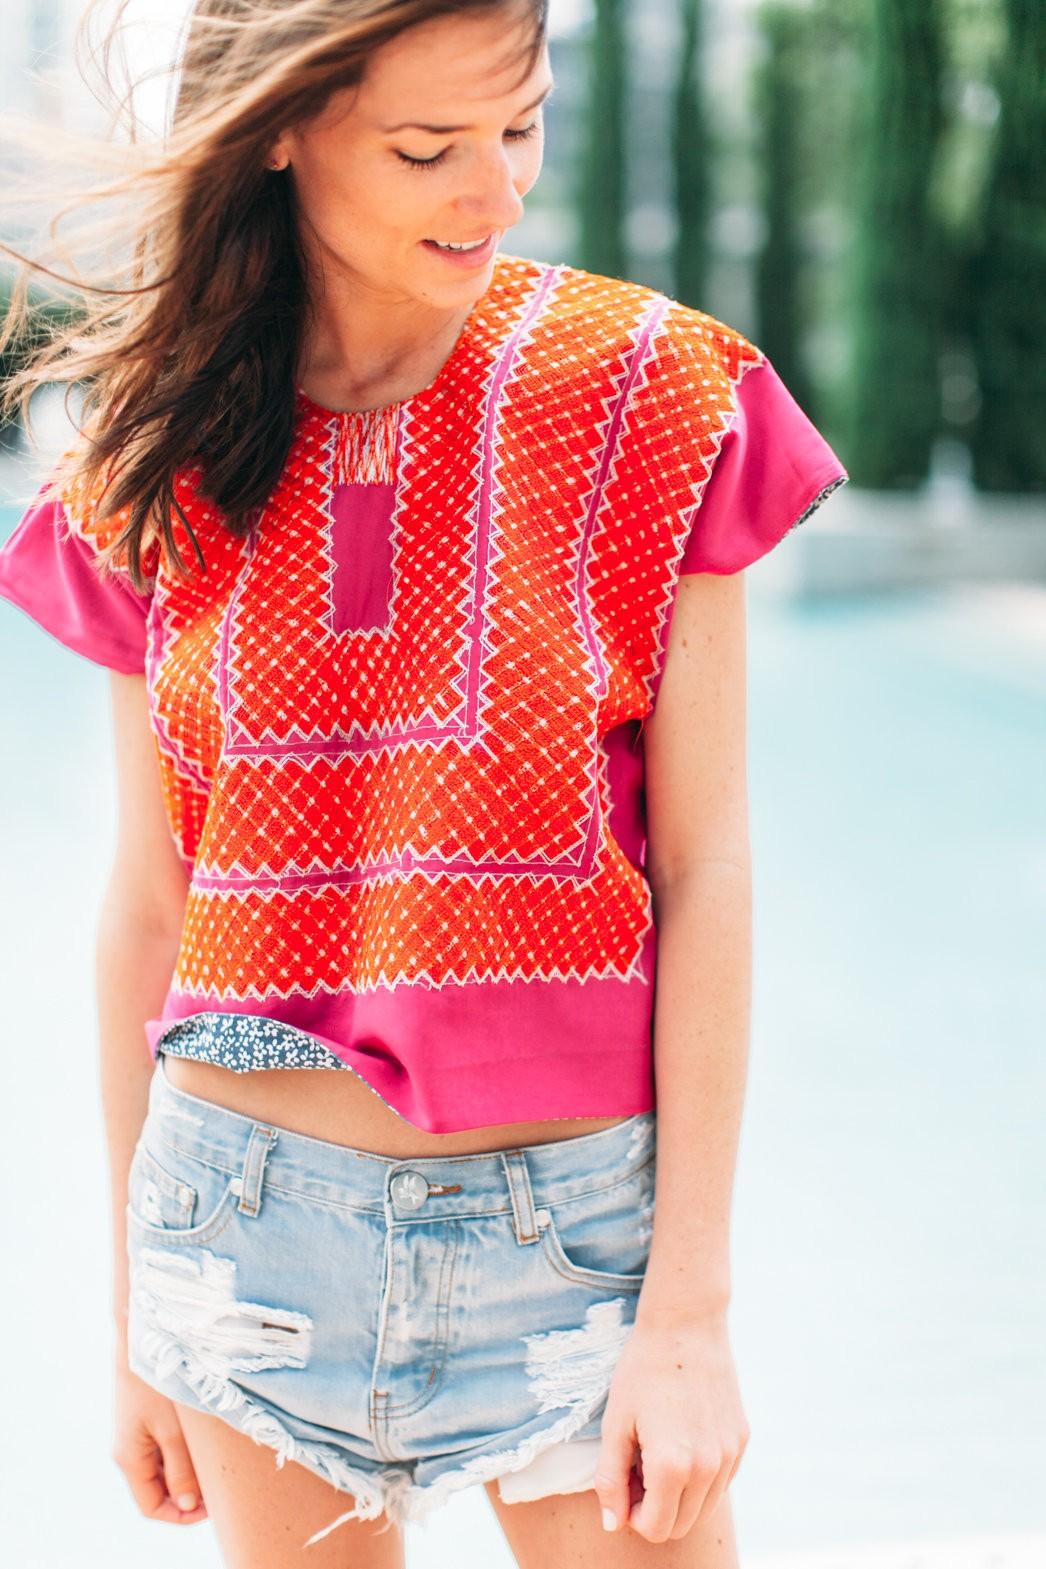 dallas-fashion-blog-being-bridget-7758